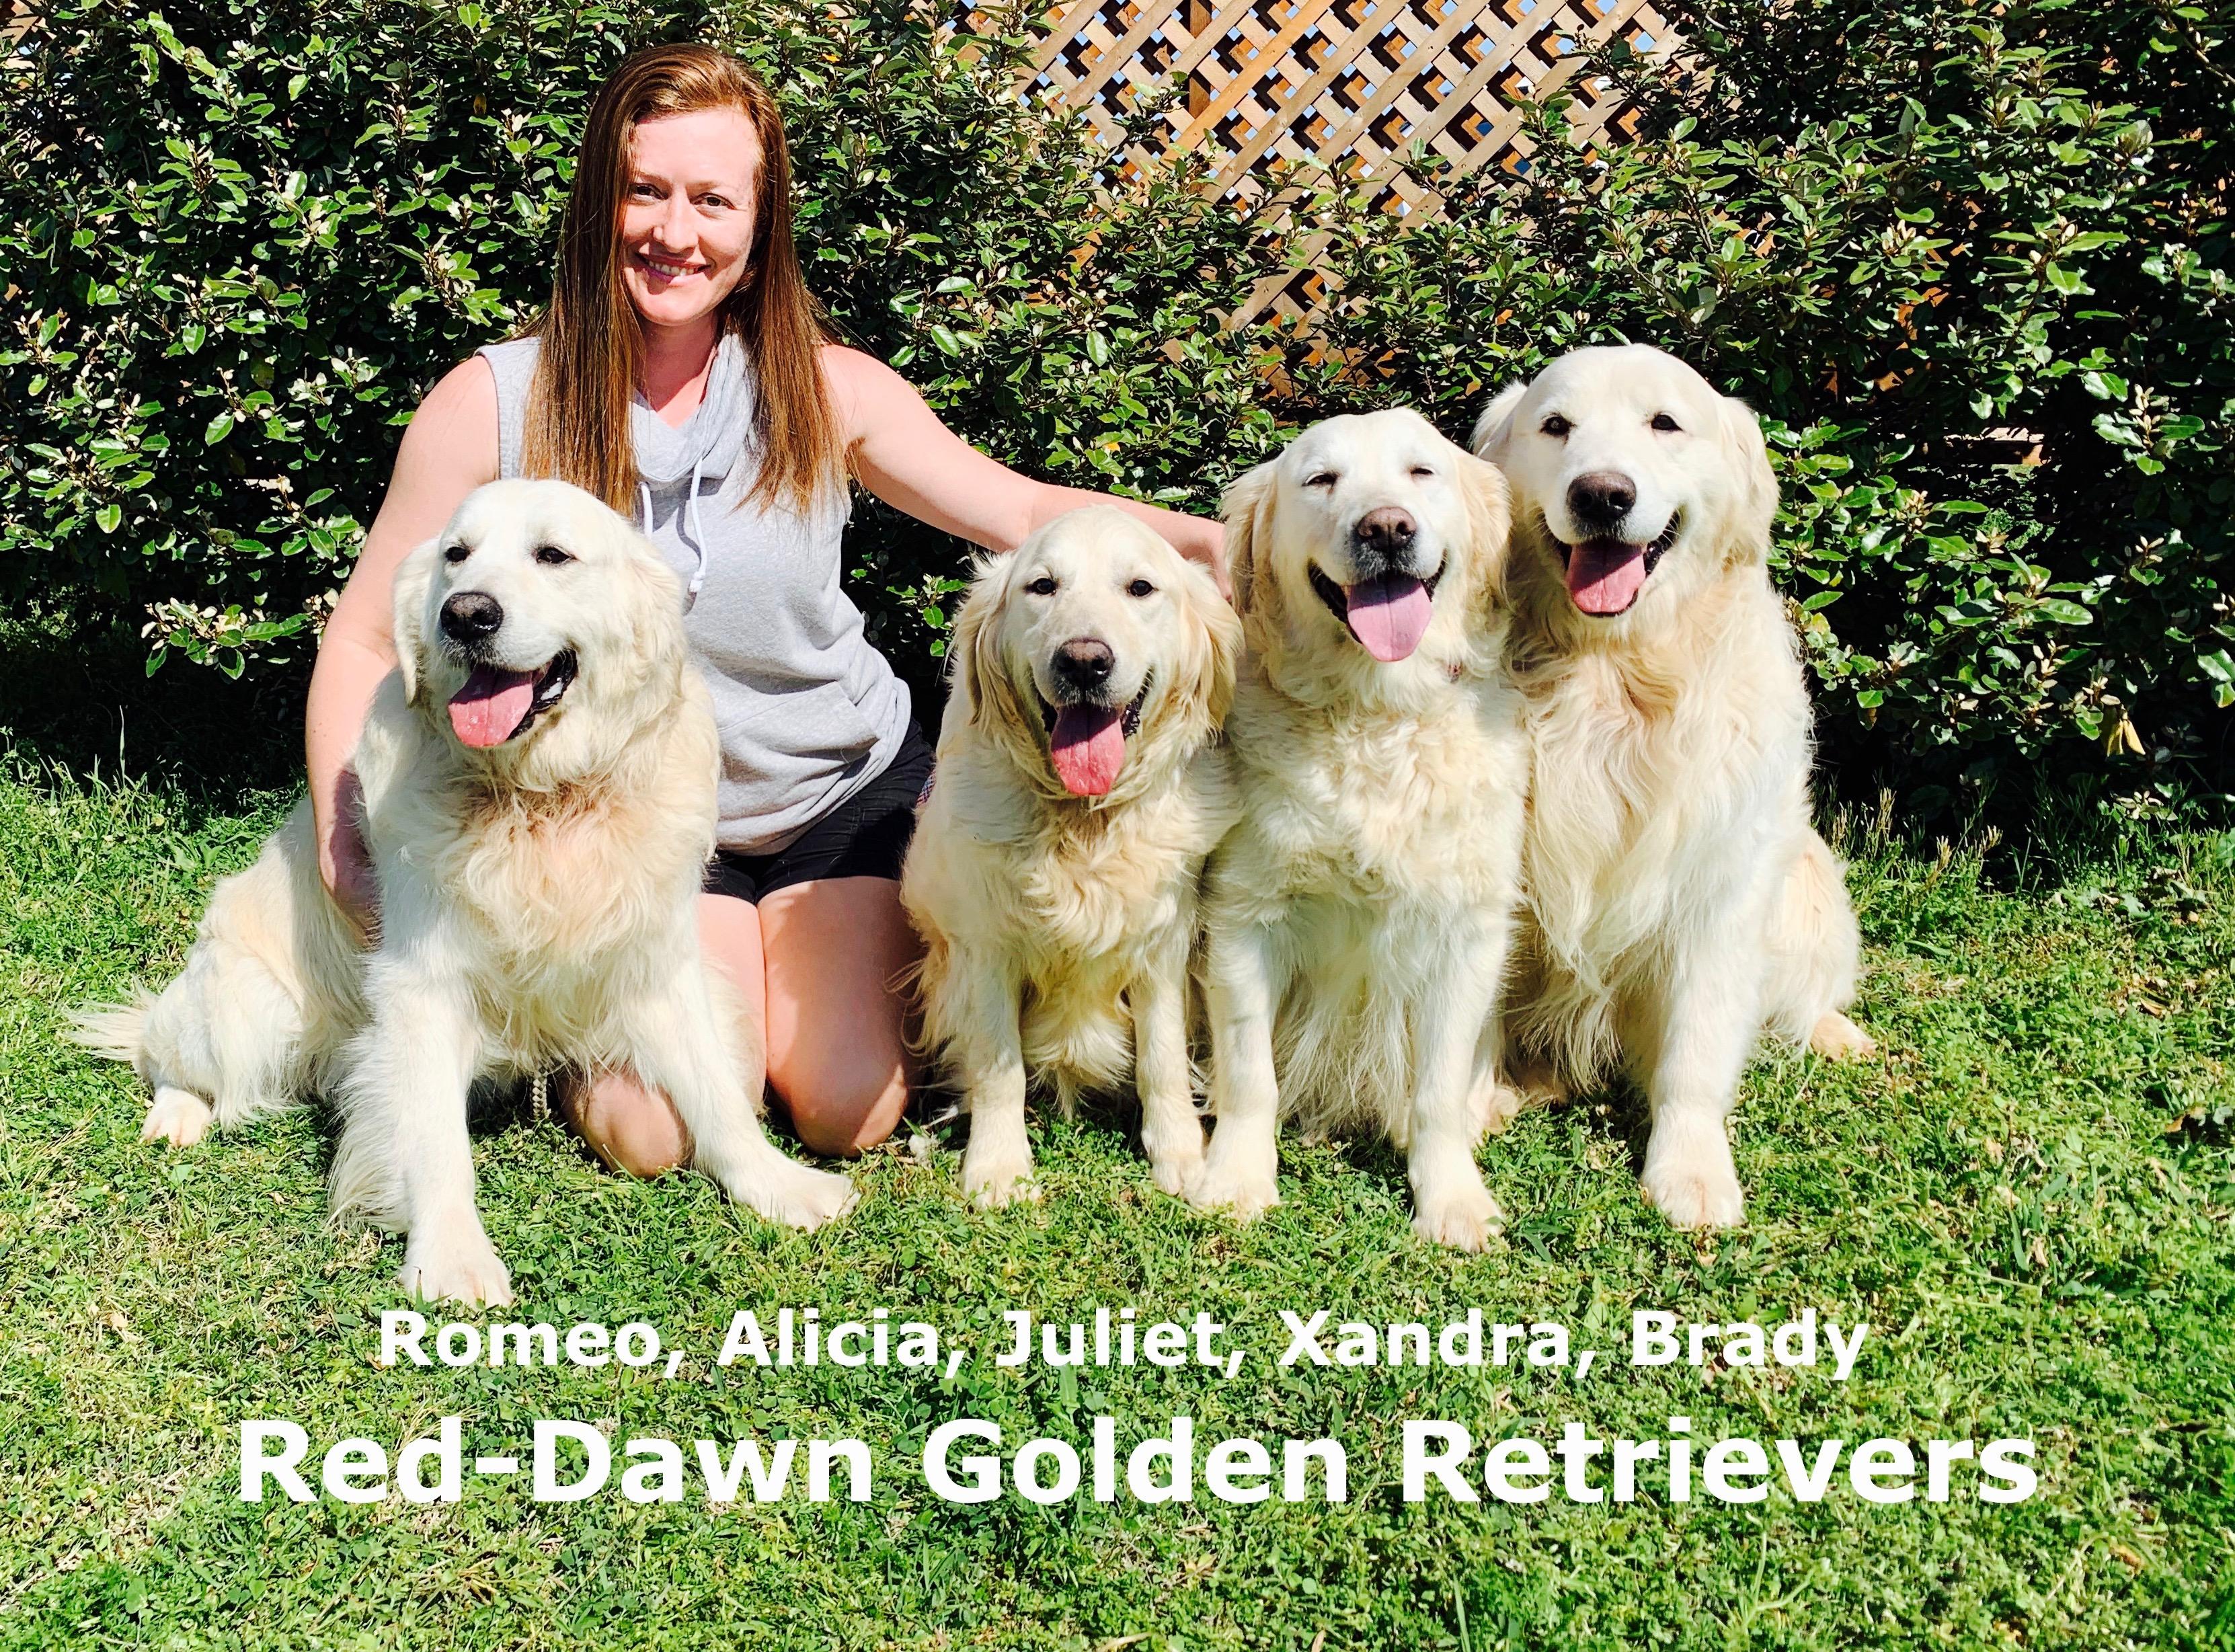 Golden Retriever Breeder in Dallas Texas | Red-Dawn Golden